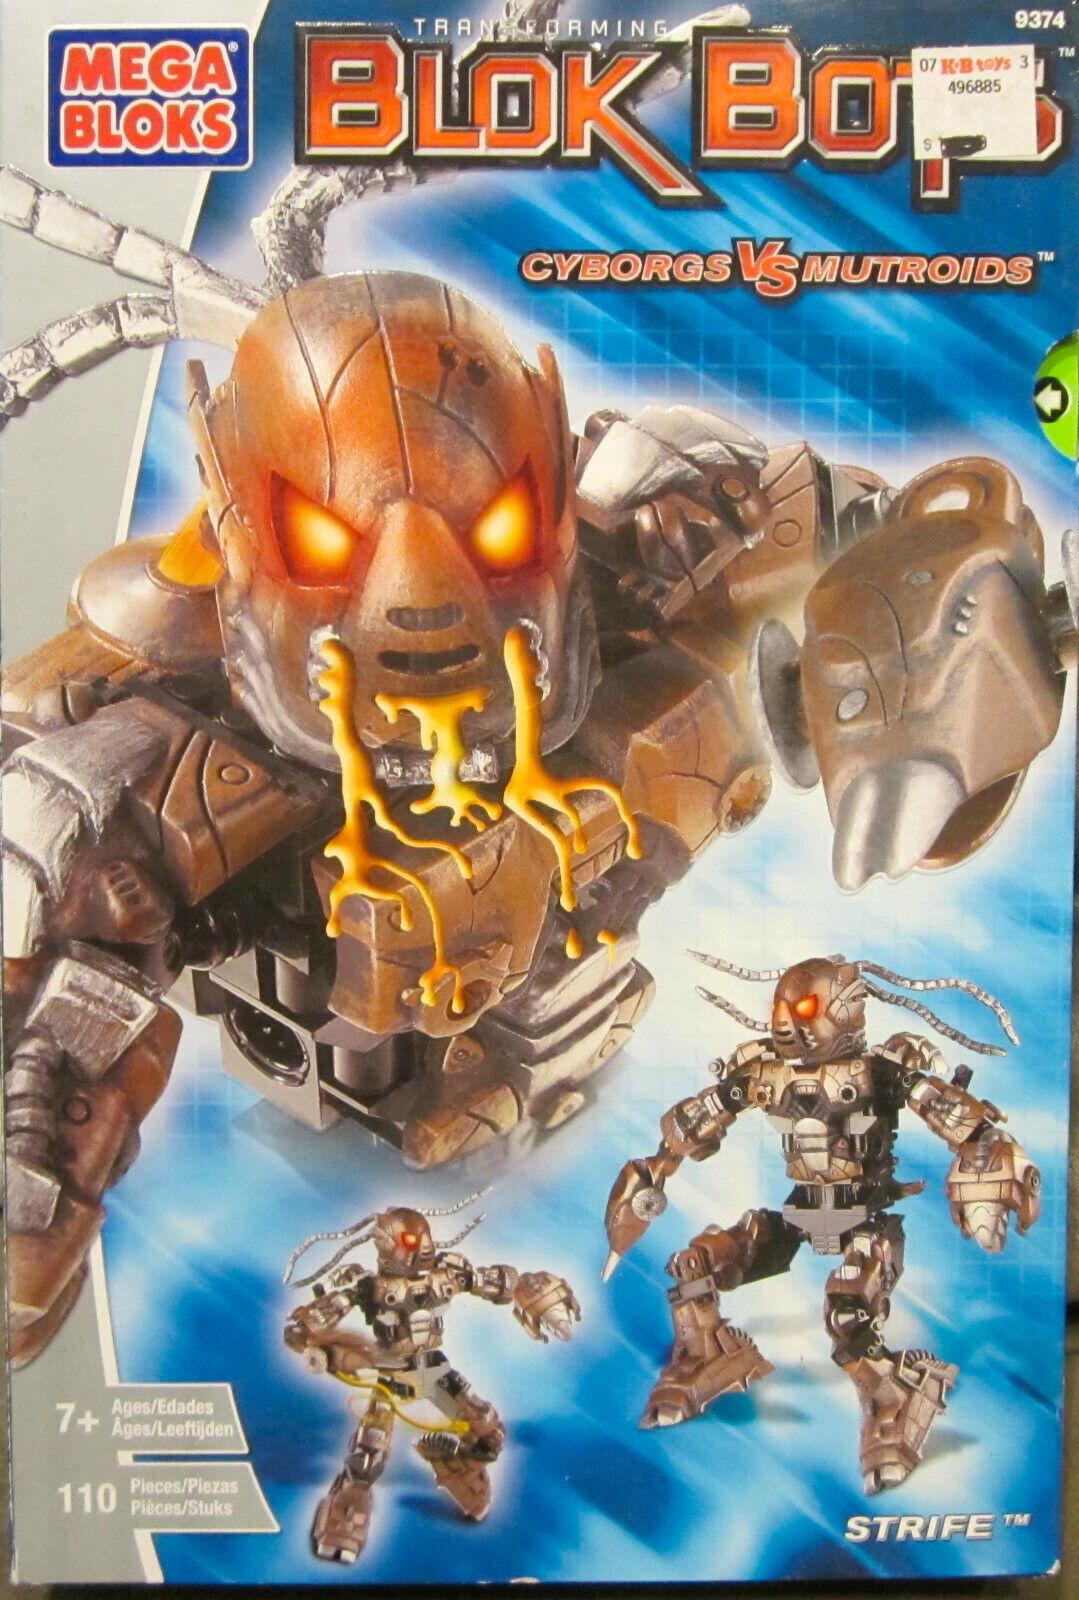 Mega Bloks Transforming Blok Bots Bots Bots Cyborgs Vs Mutroids - STRIFE - 110 Pieces -NEW 416067